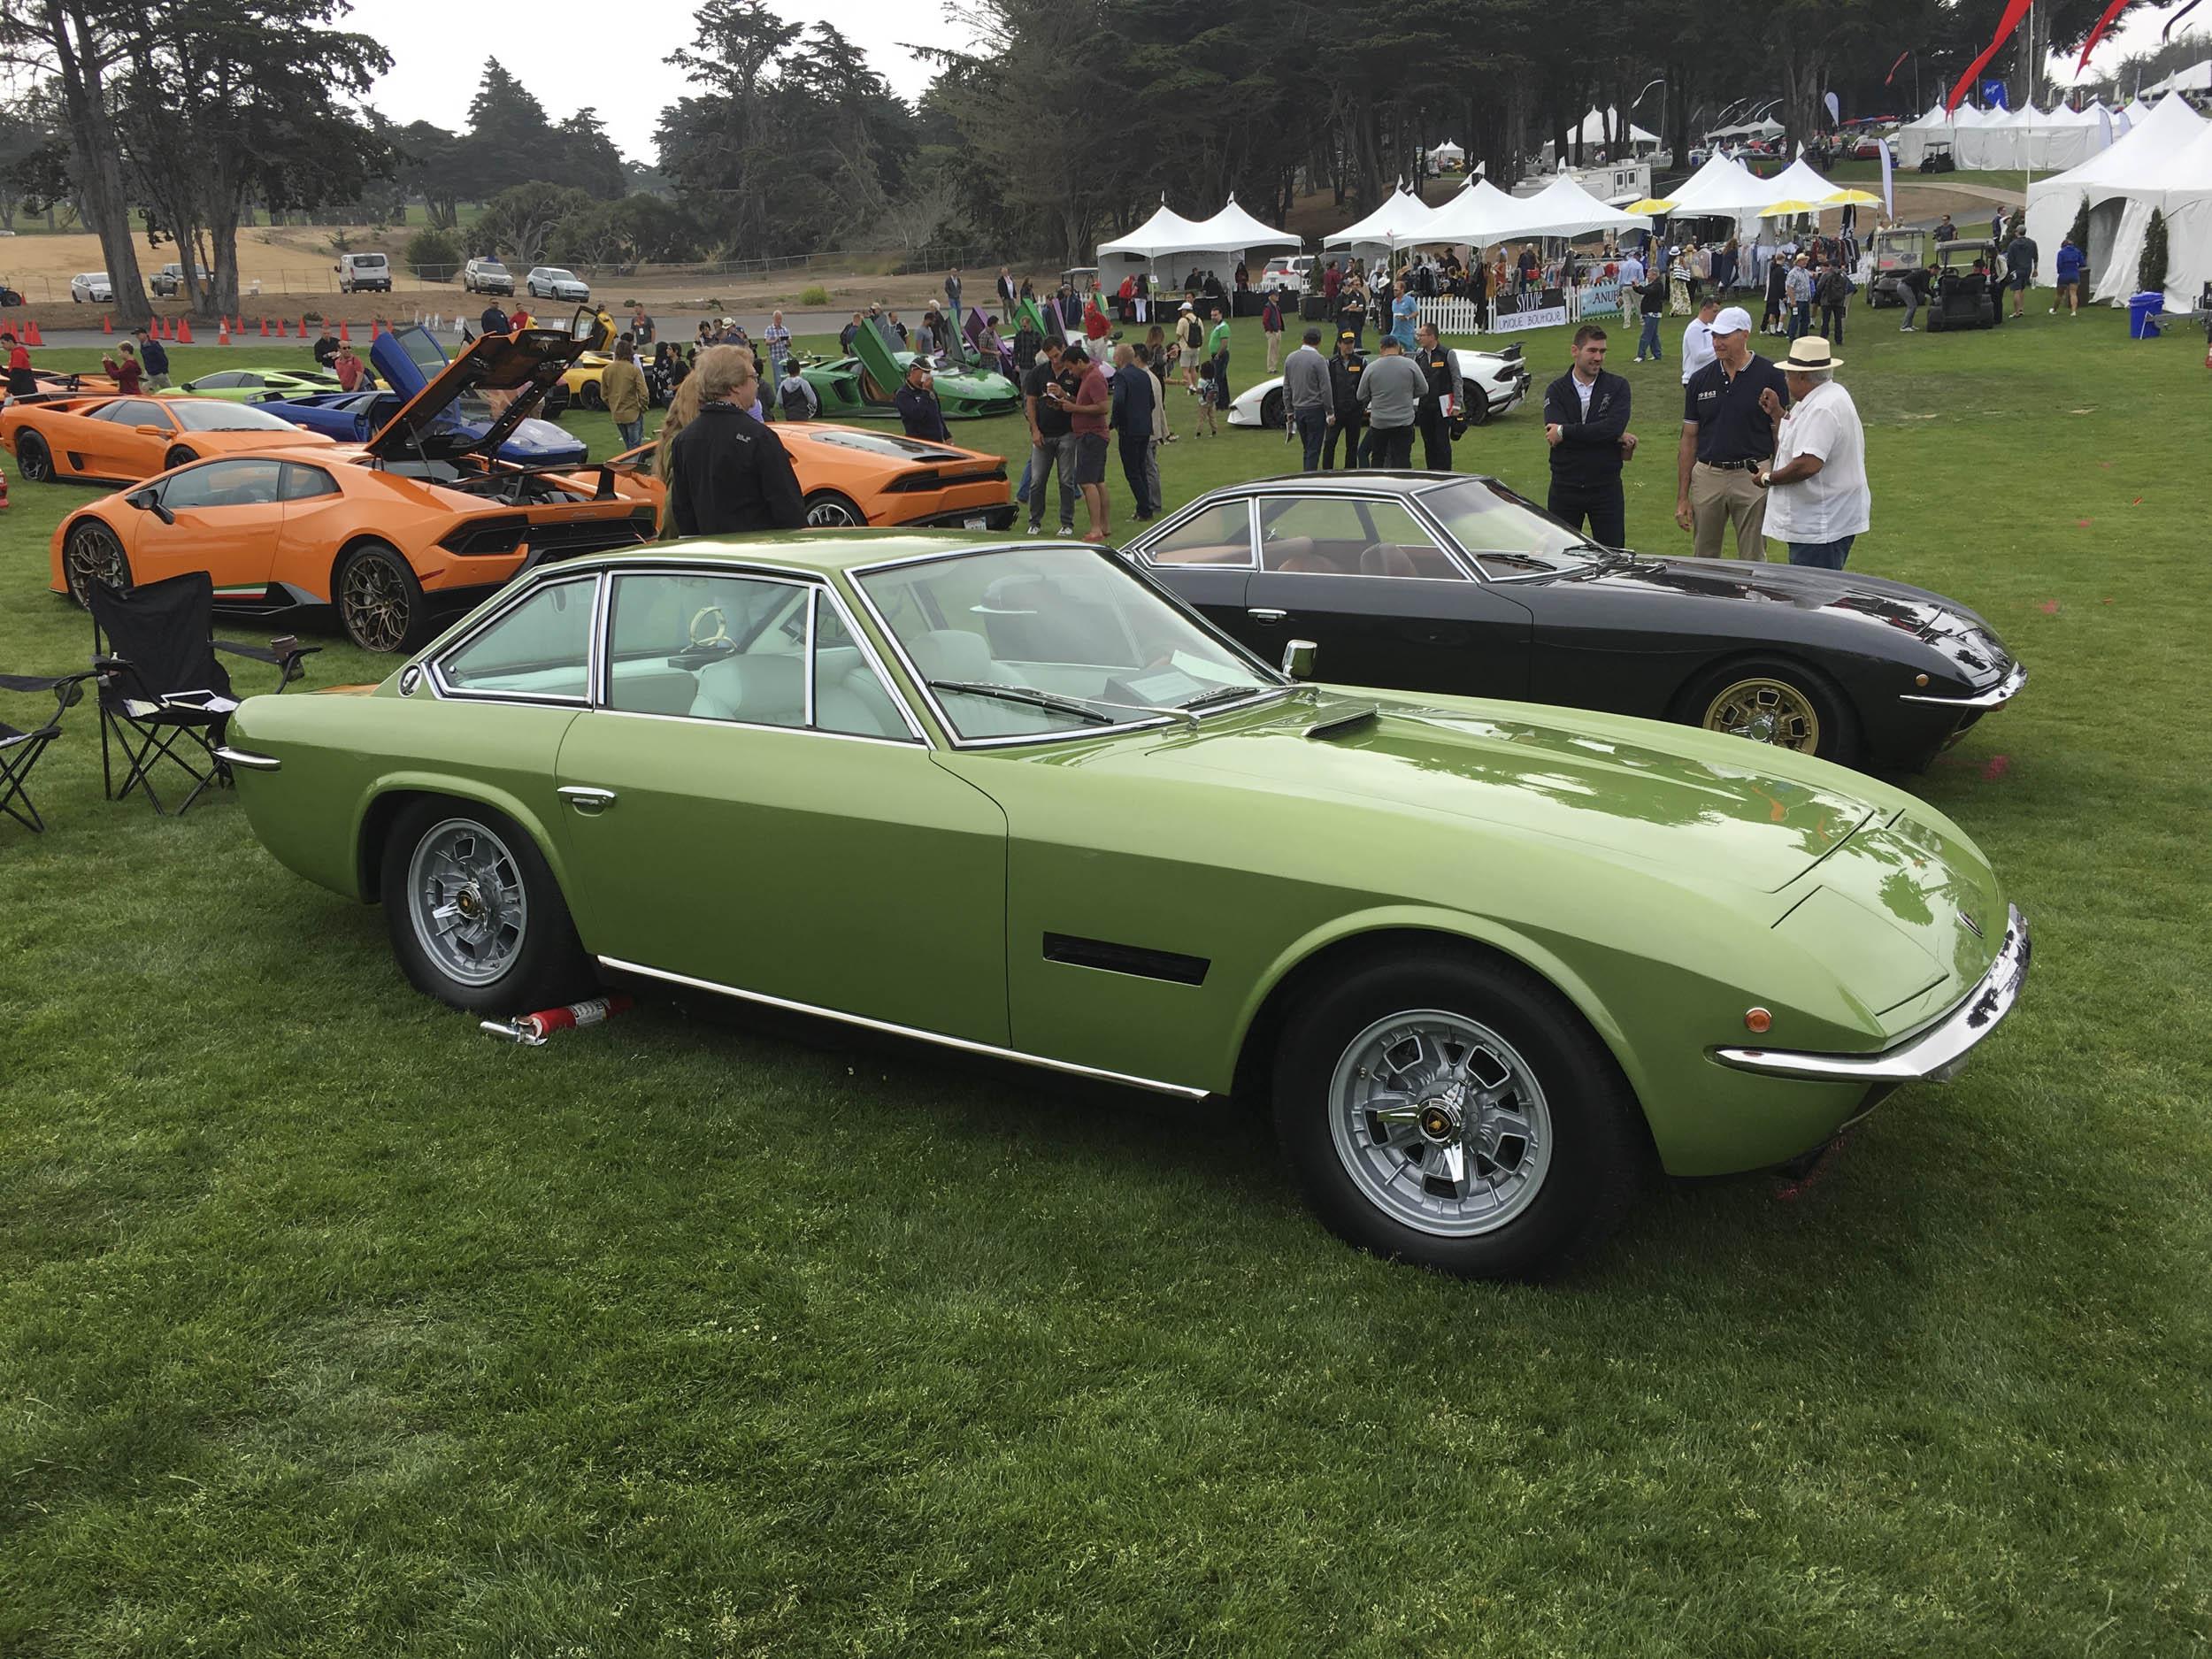 1969 Lamborghini Islero S front 3/4